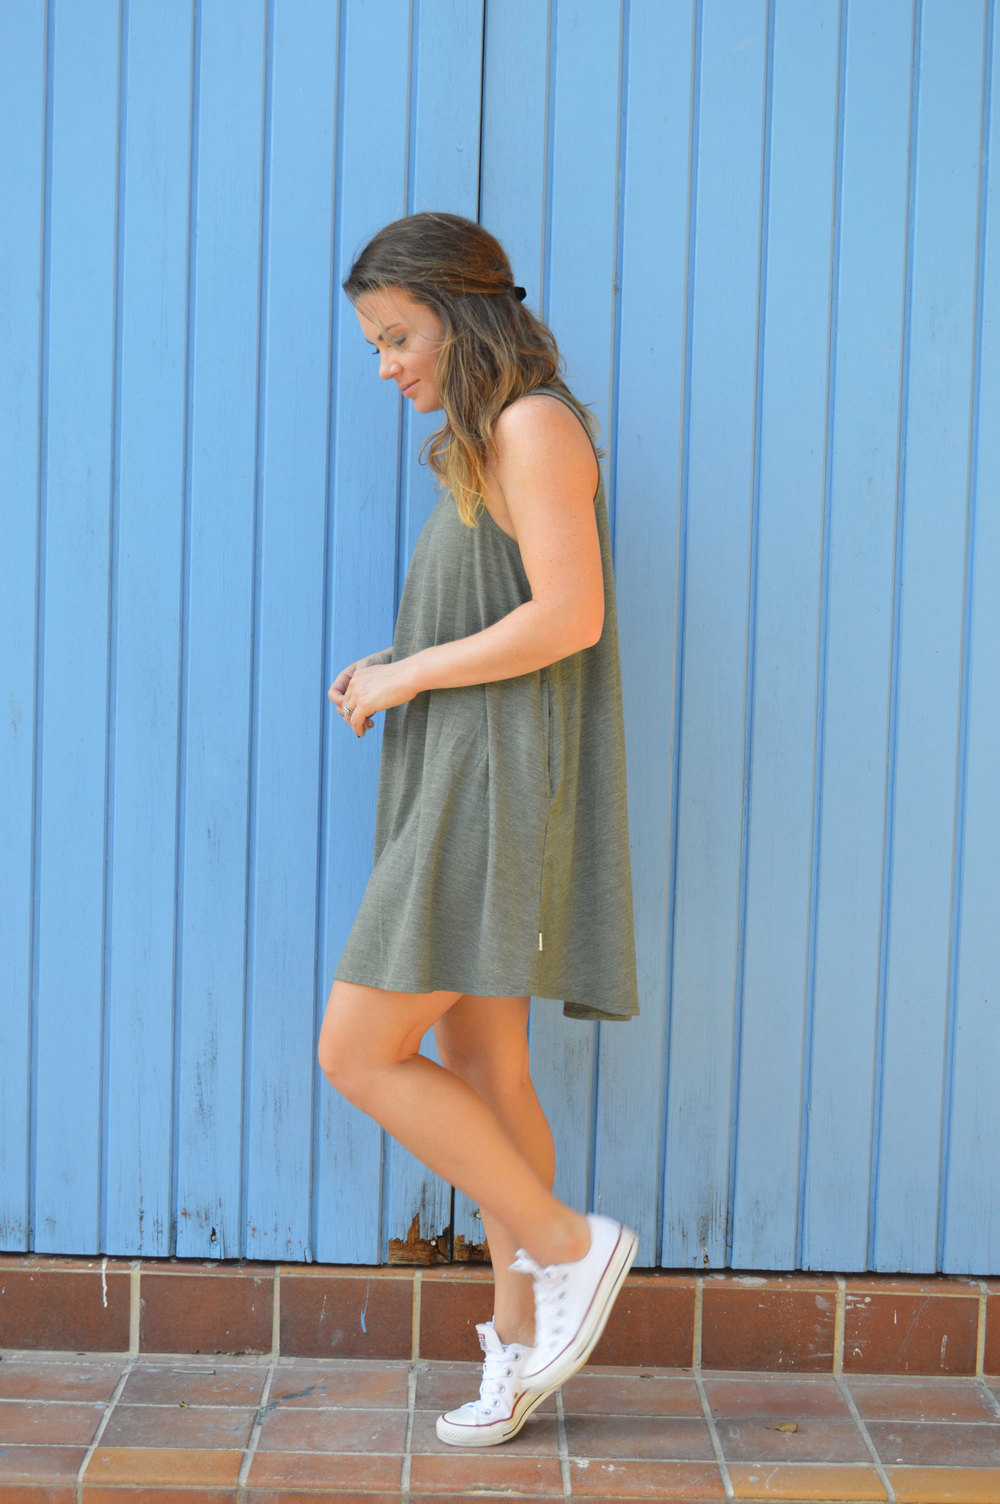 RVCA-Sundress-Pockets-Converse-Casual-Summer-WIW-Style-Blogger-Nassau-Bahamas-Island-FromCtoC.jpeg